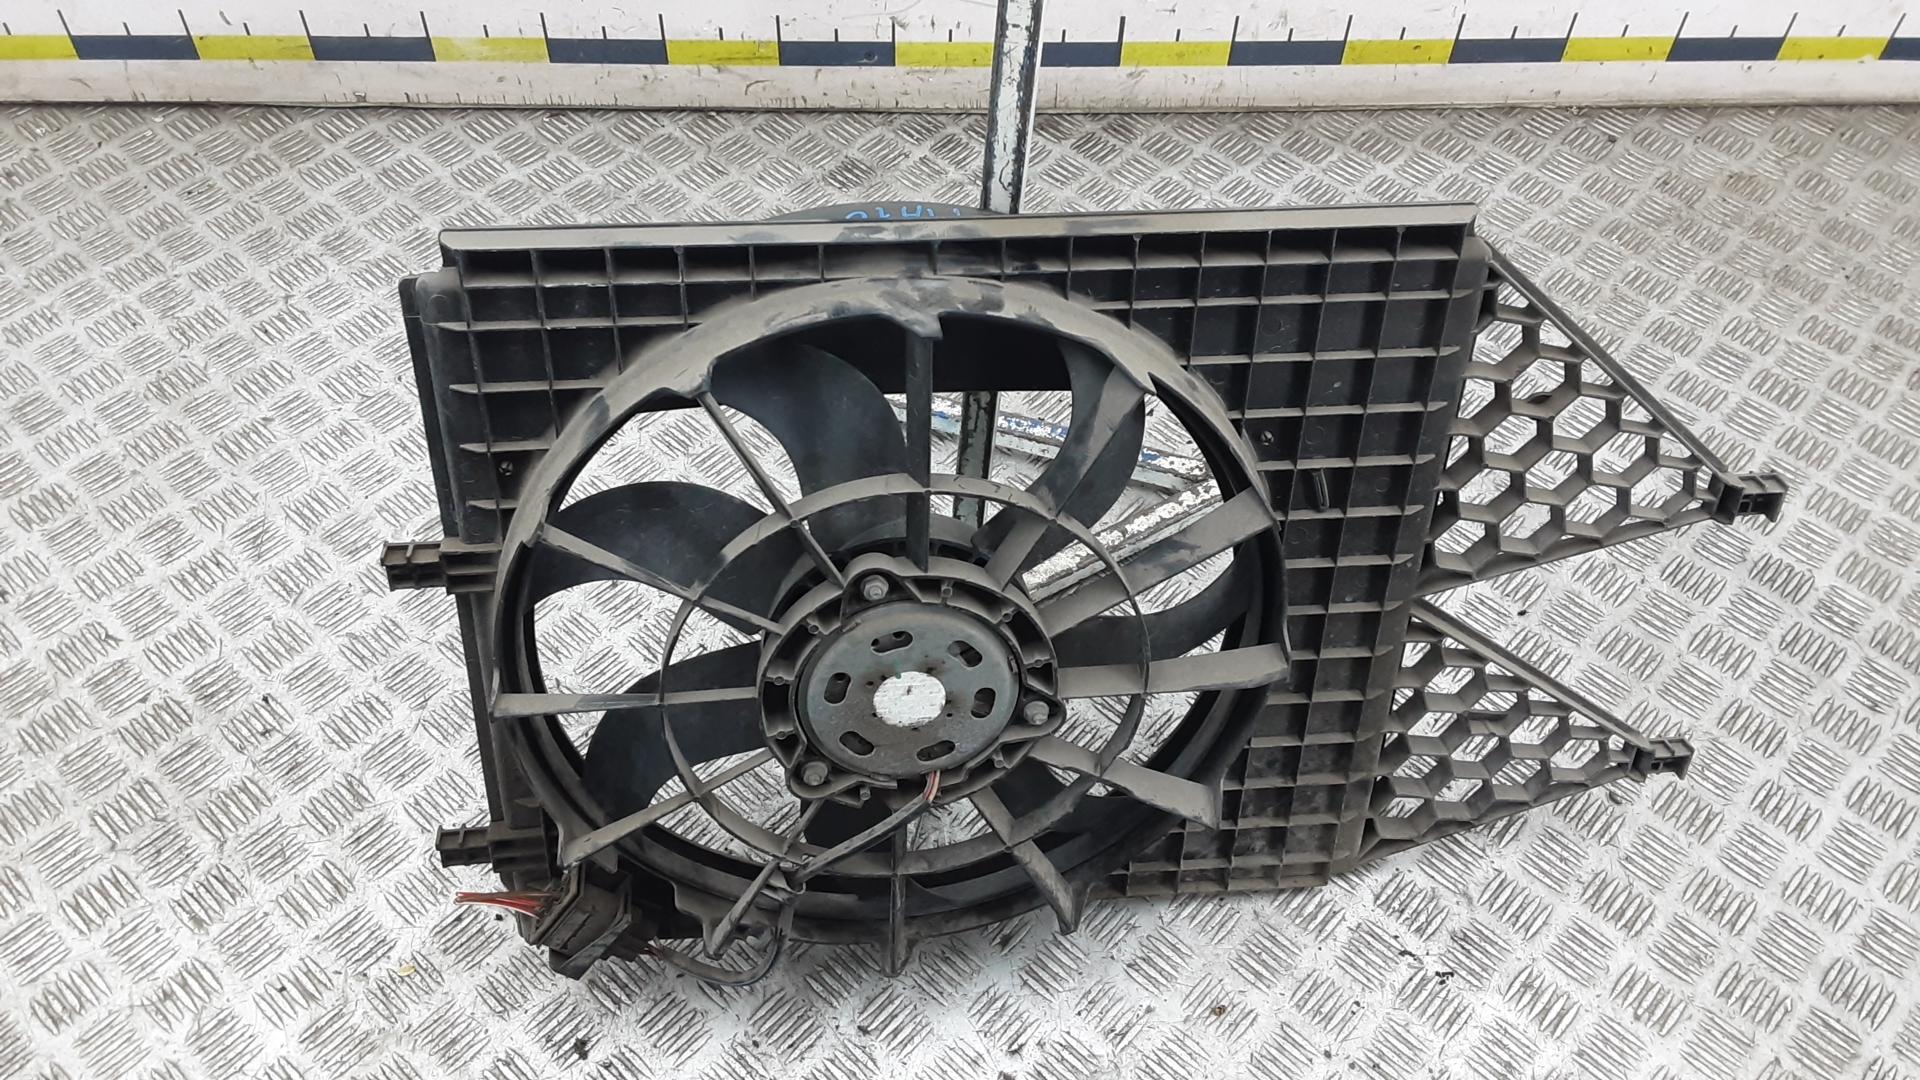 Вентилятор радиатора, SKODA, FABIA 2, 2013